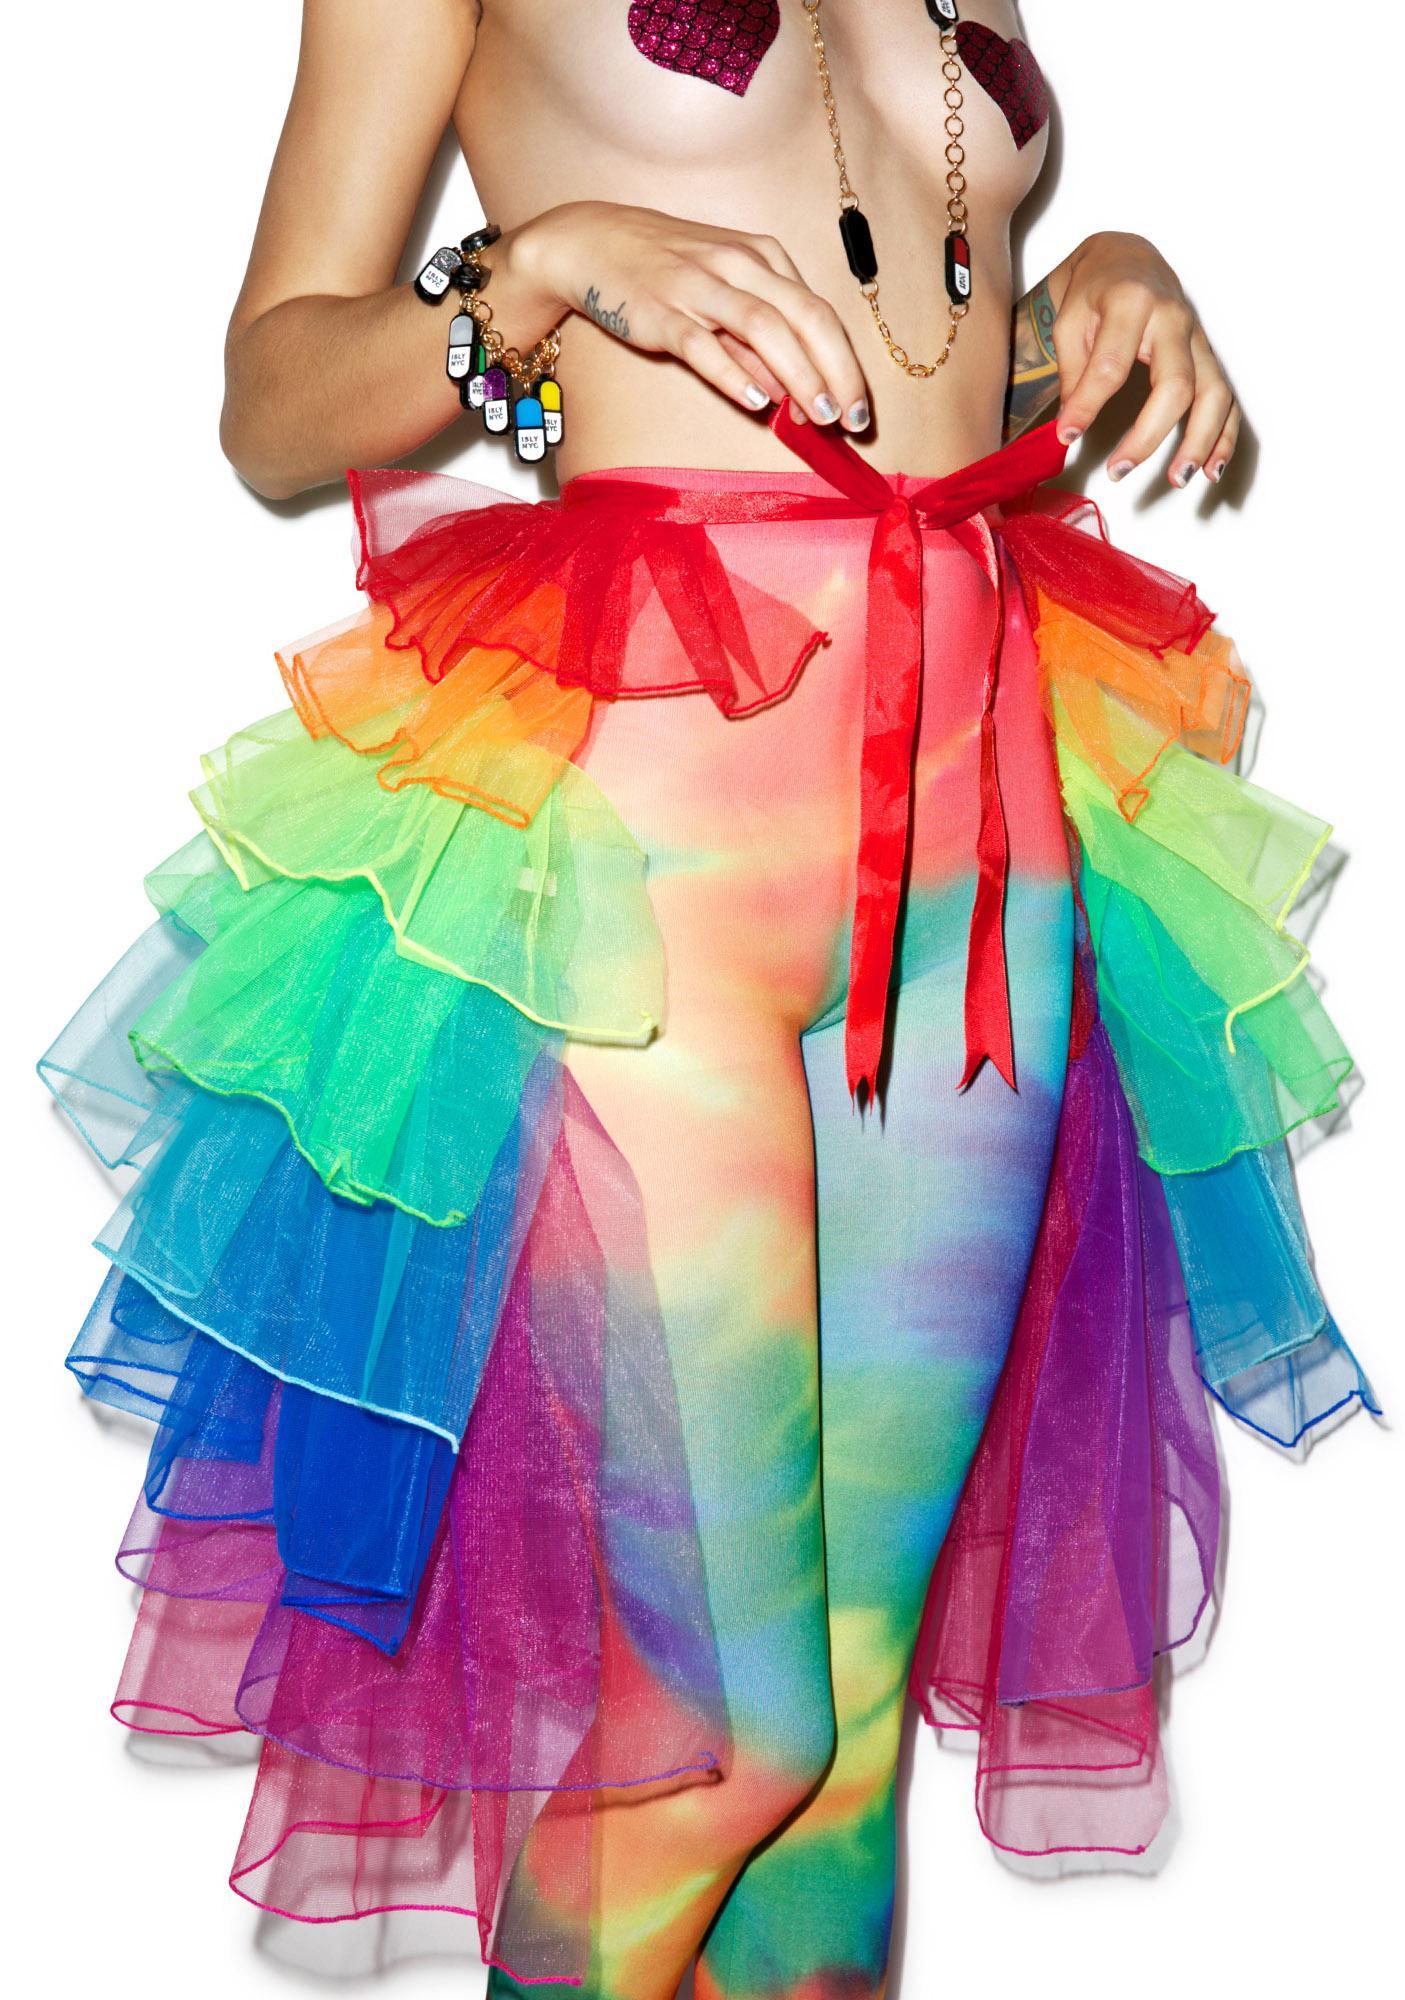 1405x2000 Follow The Rainbow Bustle Dolls Kill